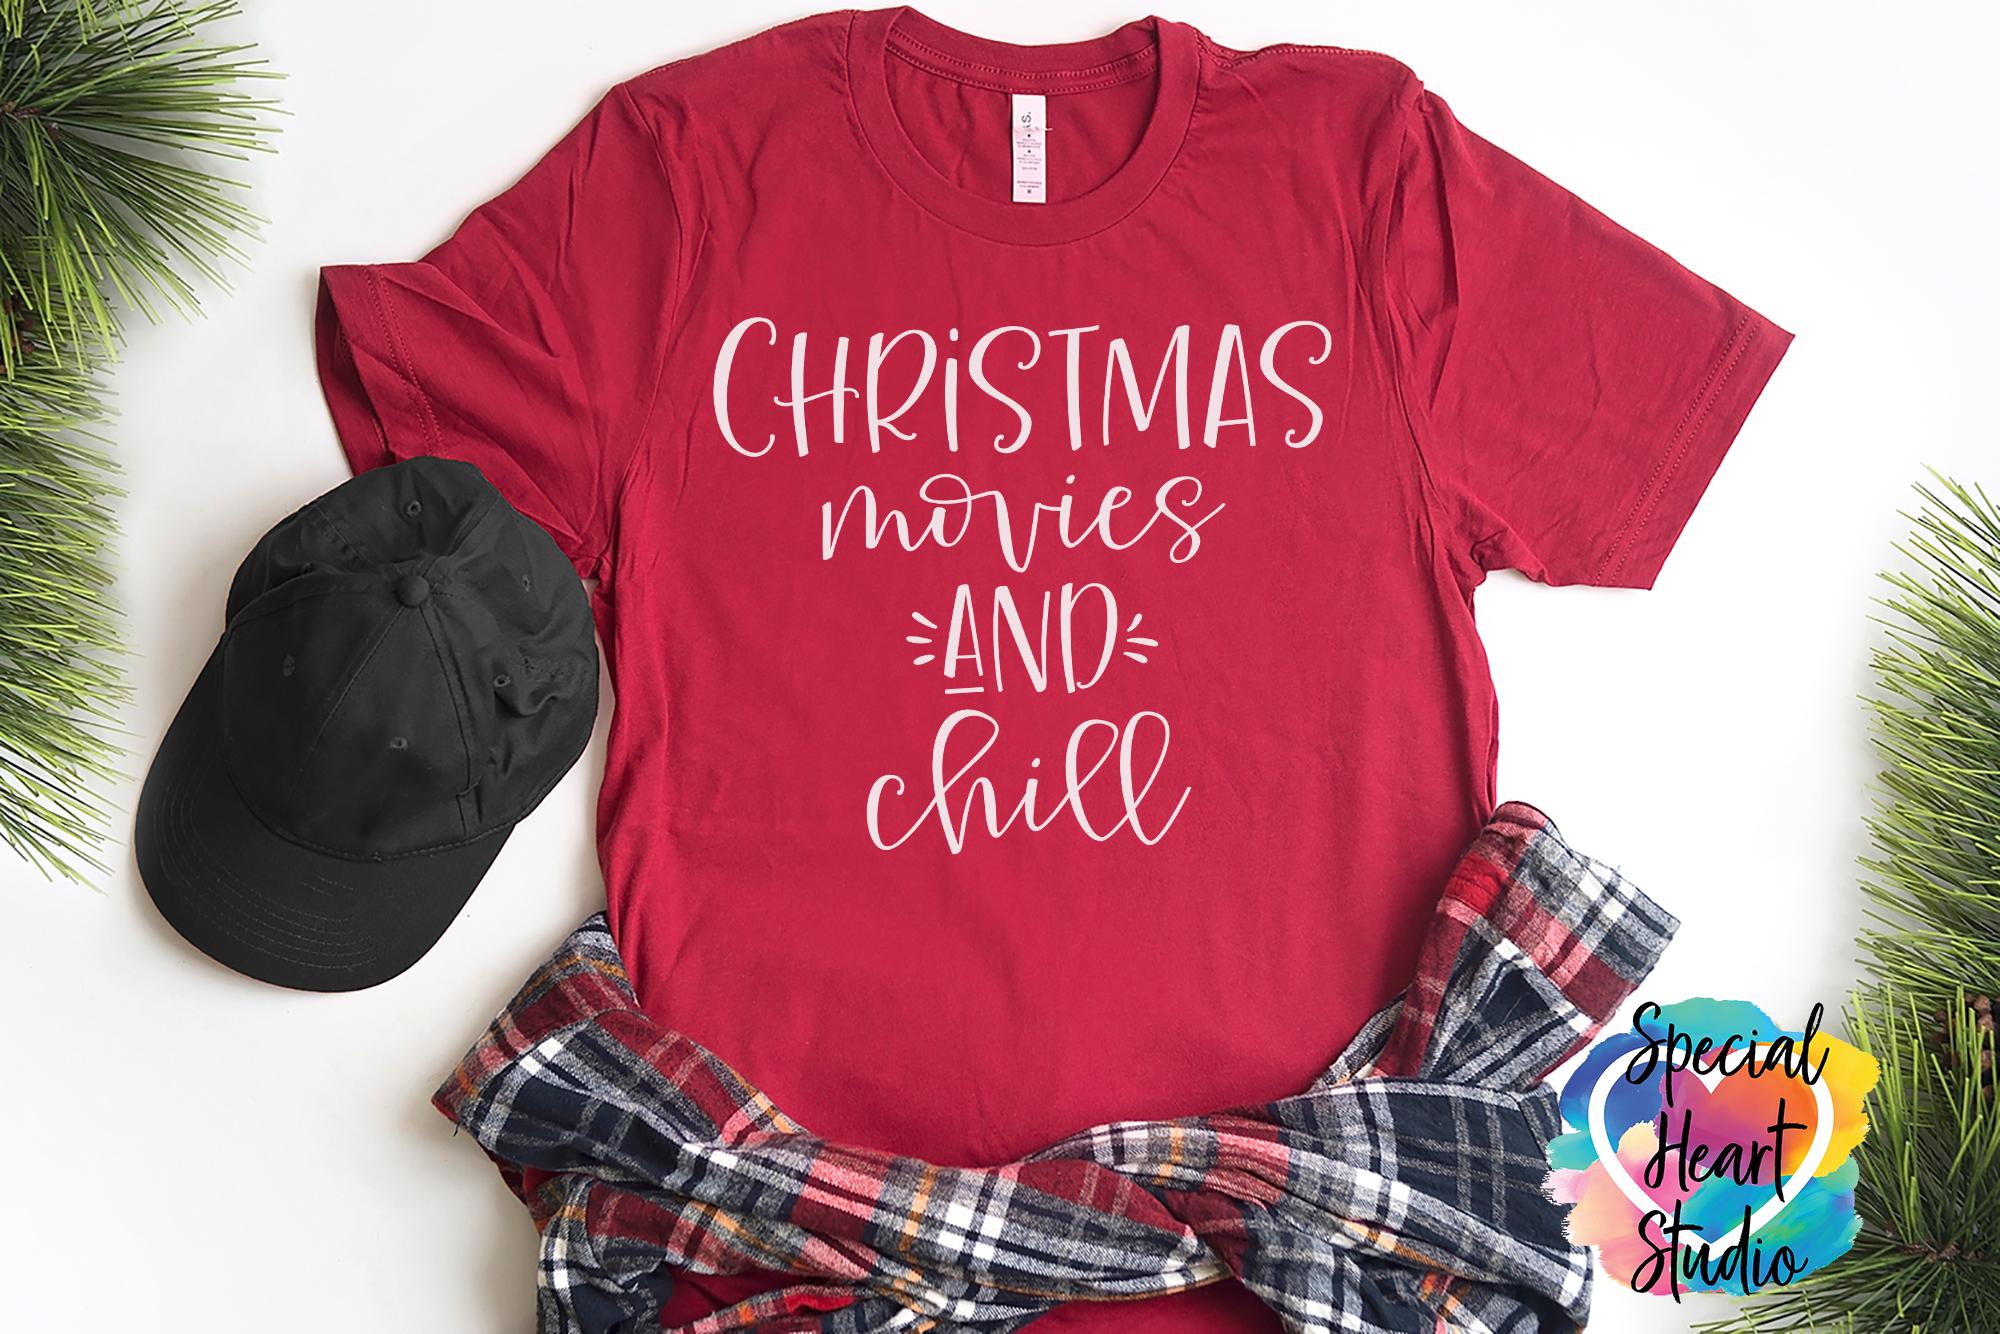 Christmas SVG Bundle - A Christmas Shirt SVG Cut File Bundle example image 10